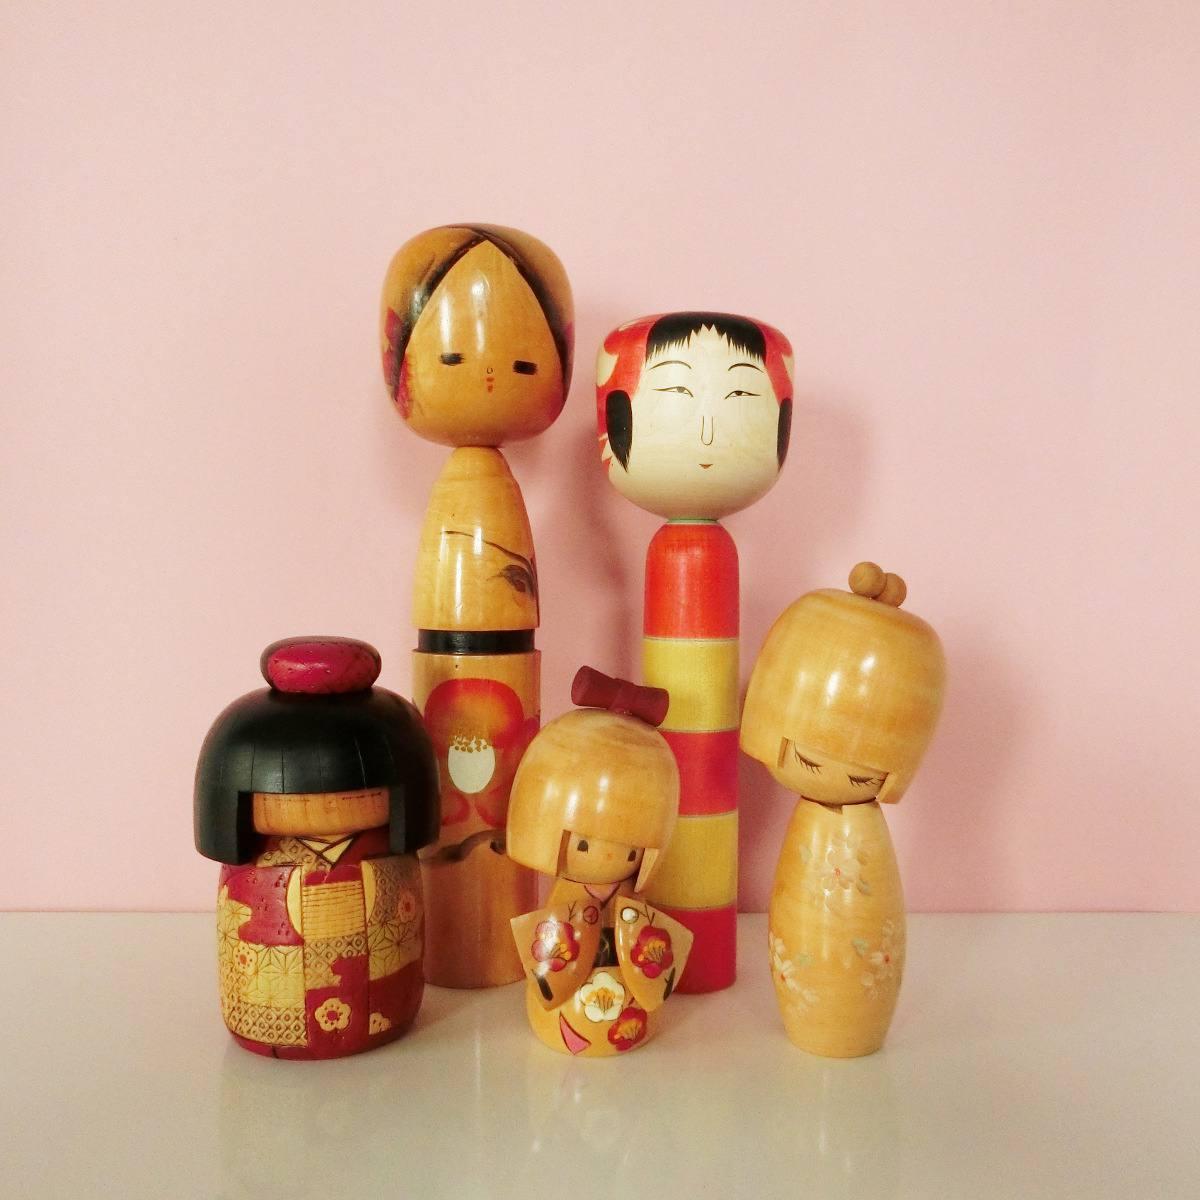 Vintage kokeshi selection - Poupées kokeshi anciennes